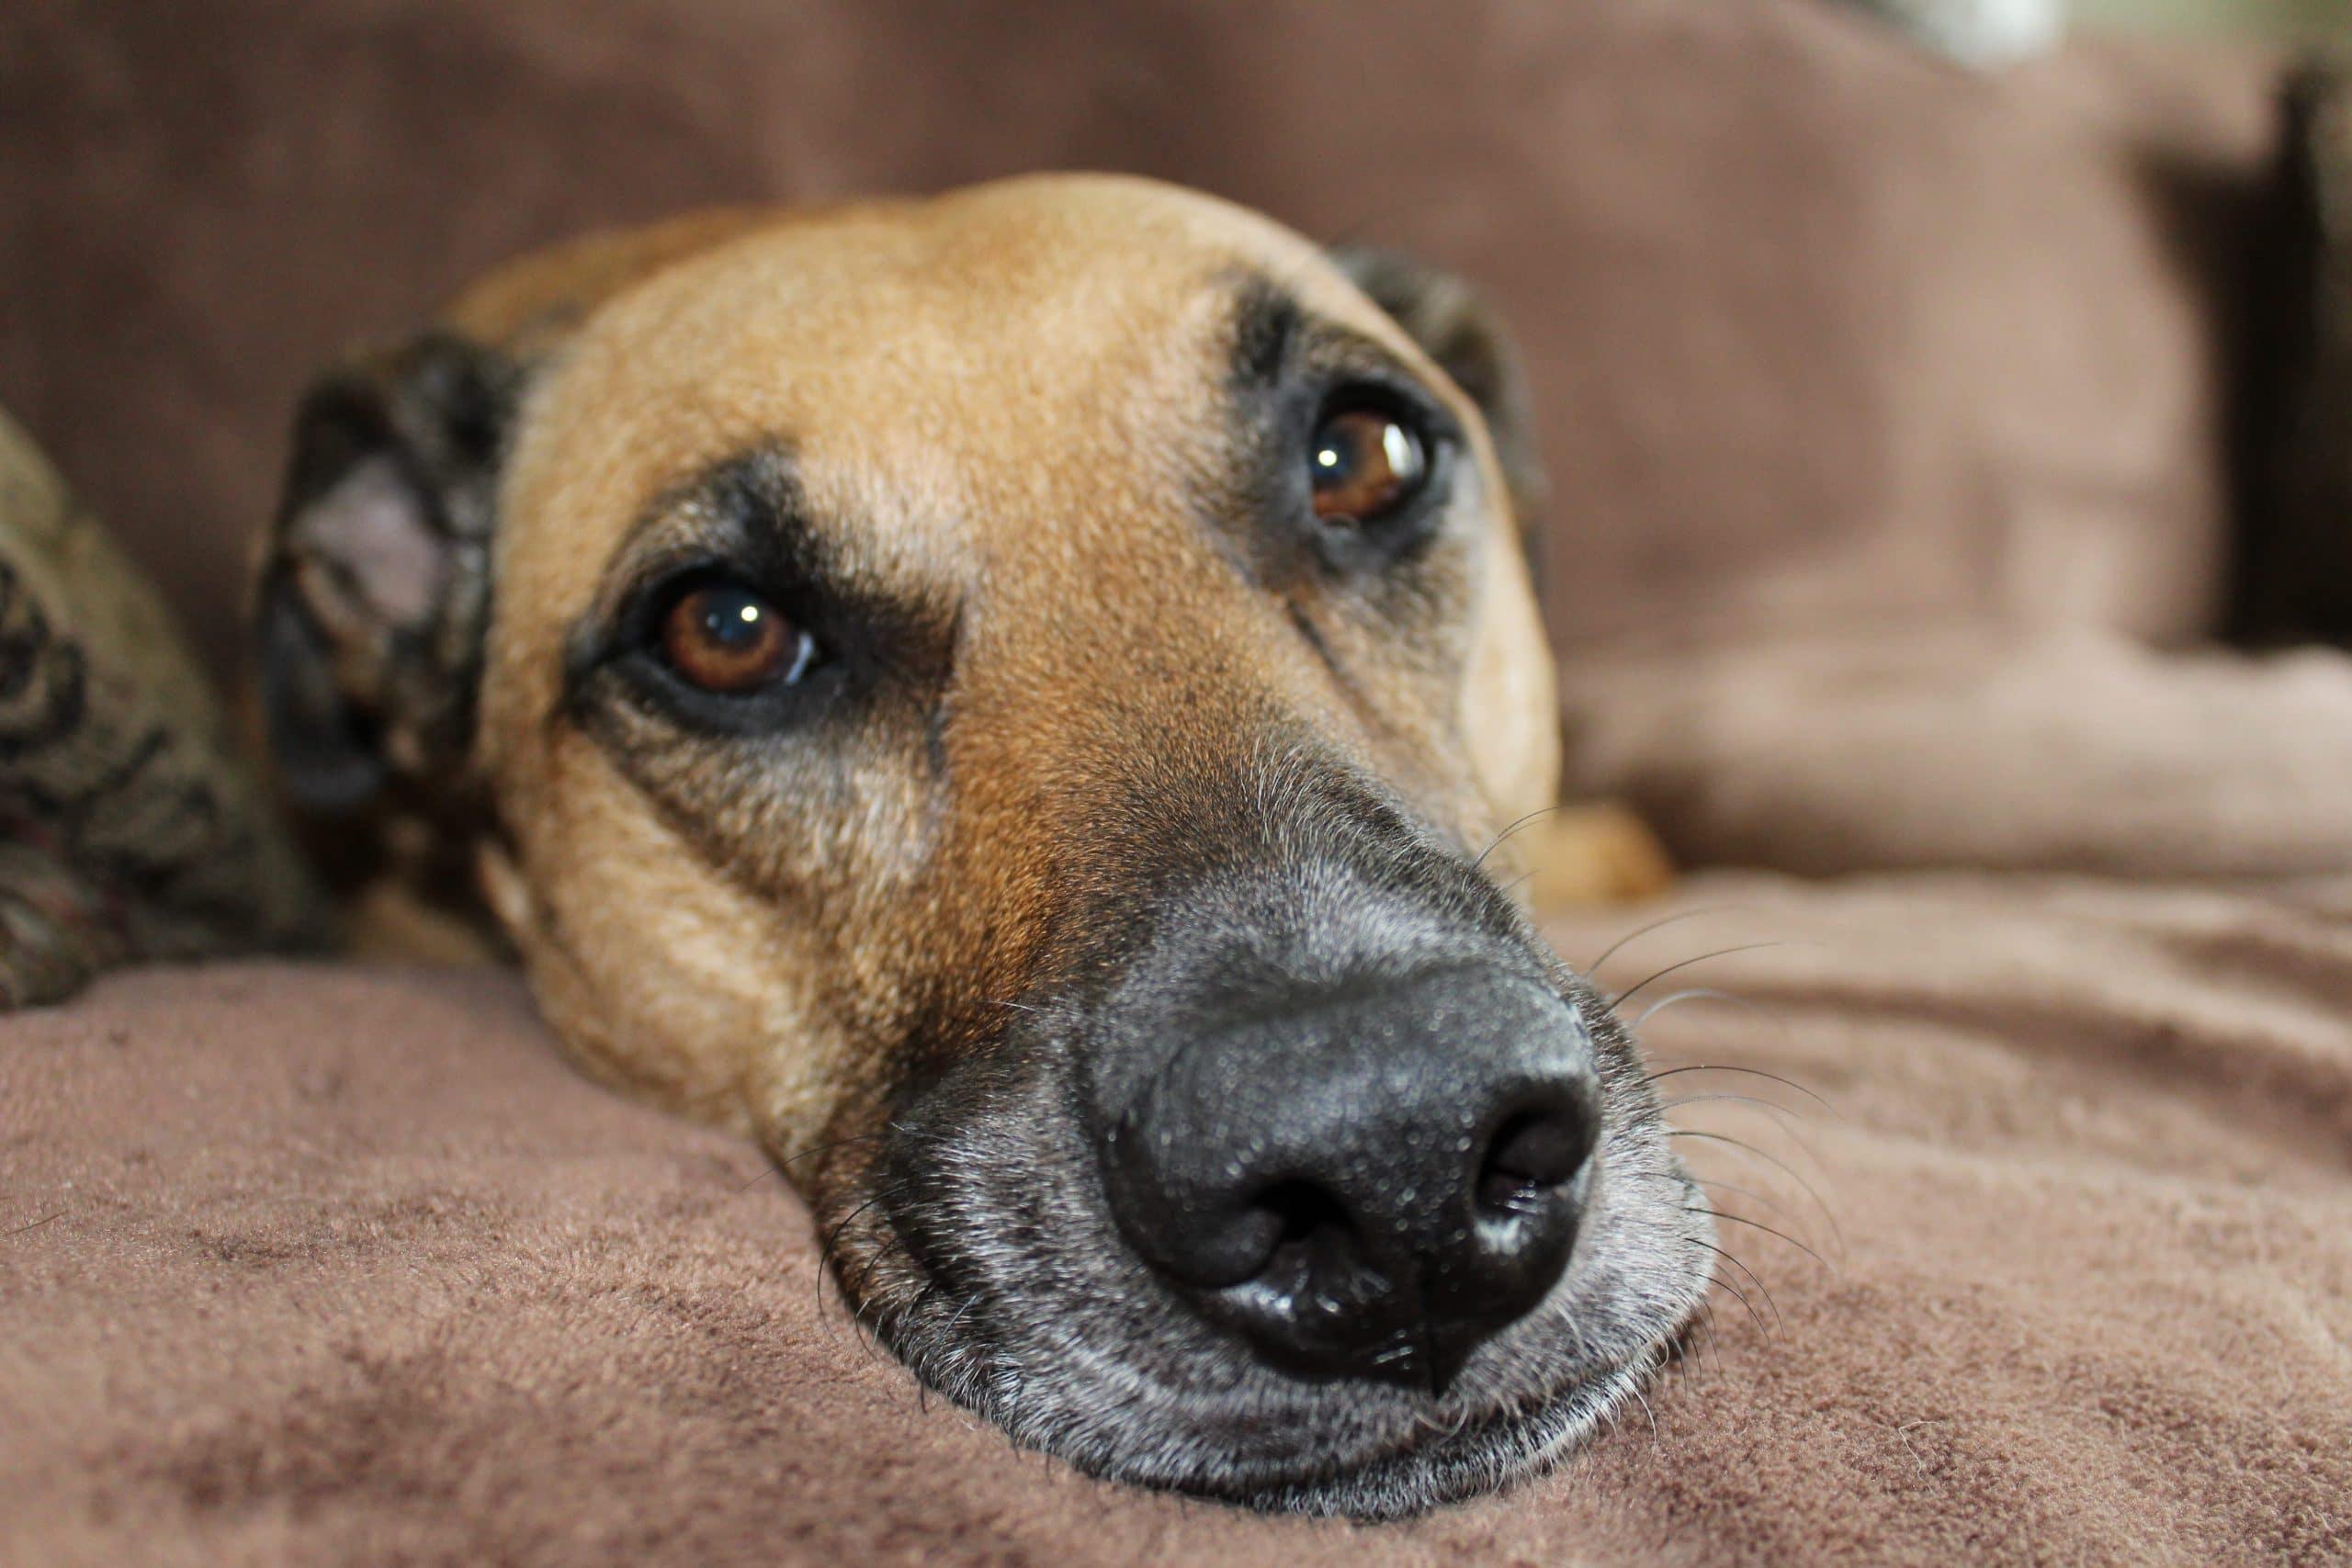 Perro adoptado descansando